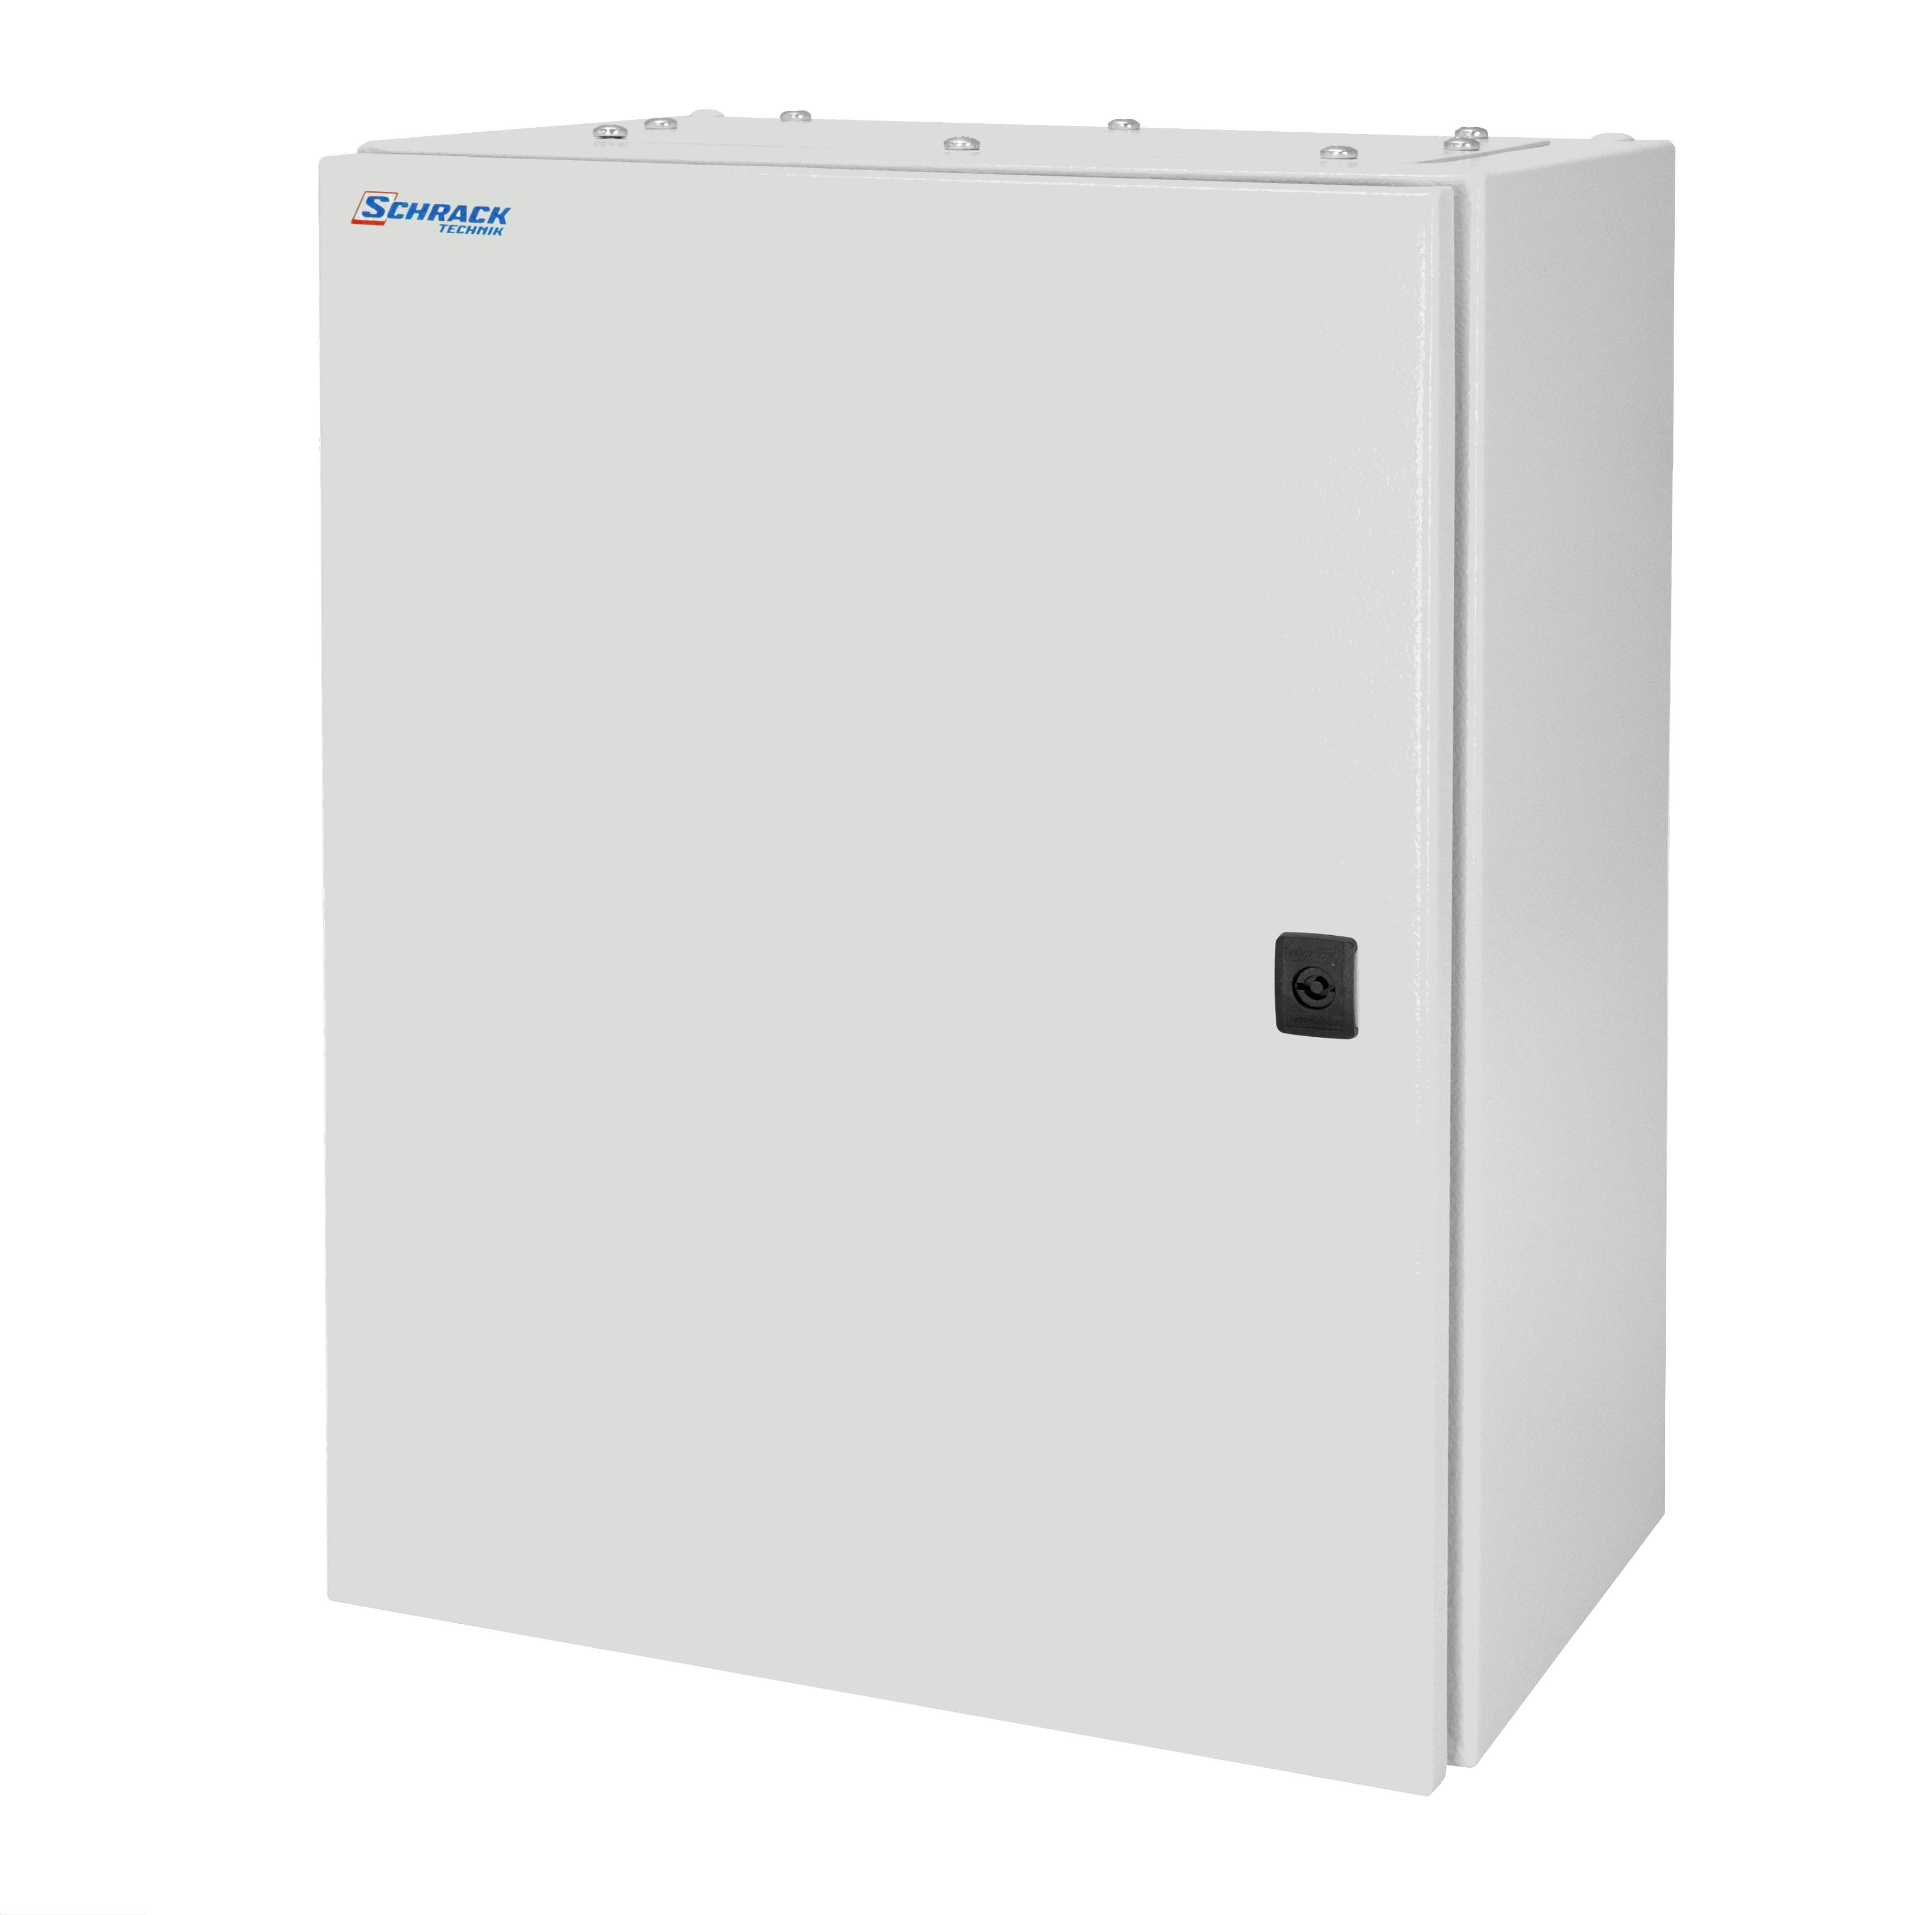 1 Stk Wandschrank Mono IP66 H=500 B=300 T=210 Stahlblech WSM5030210